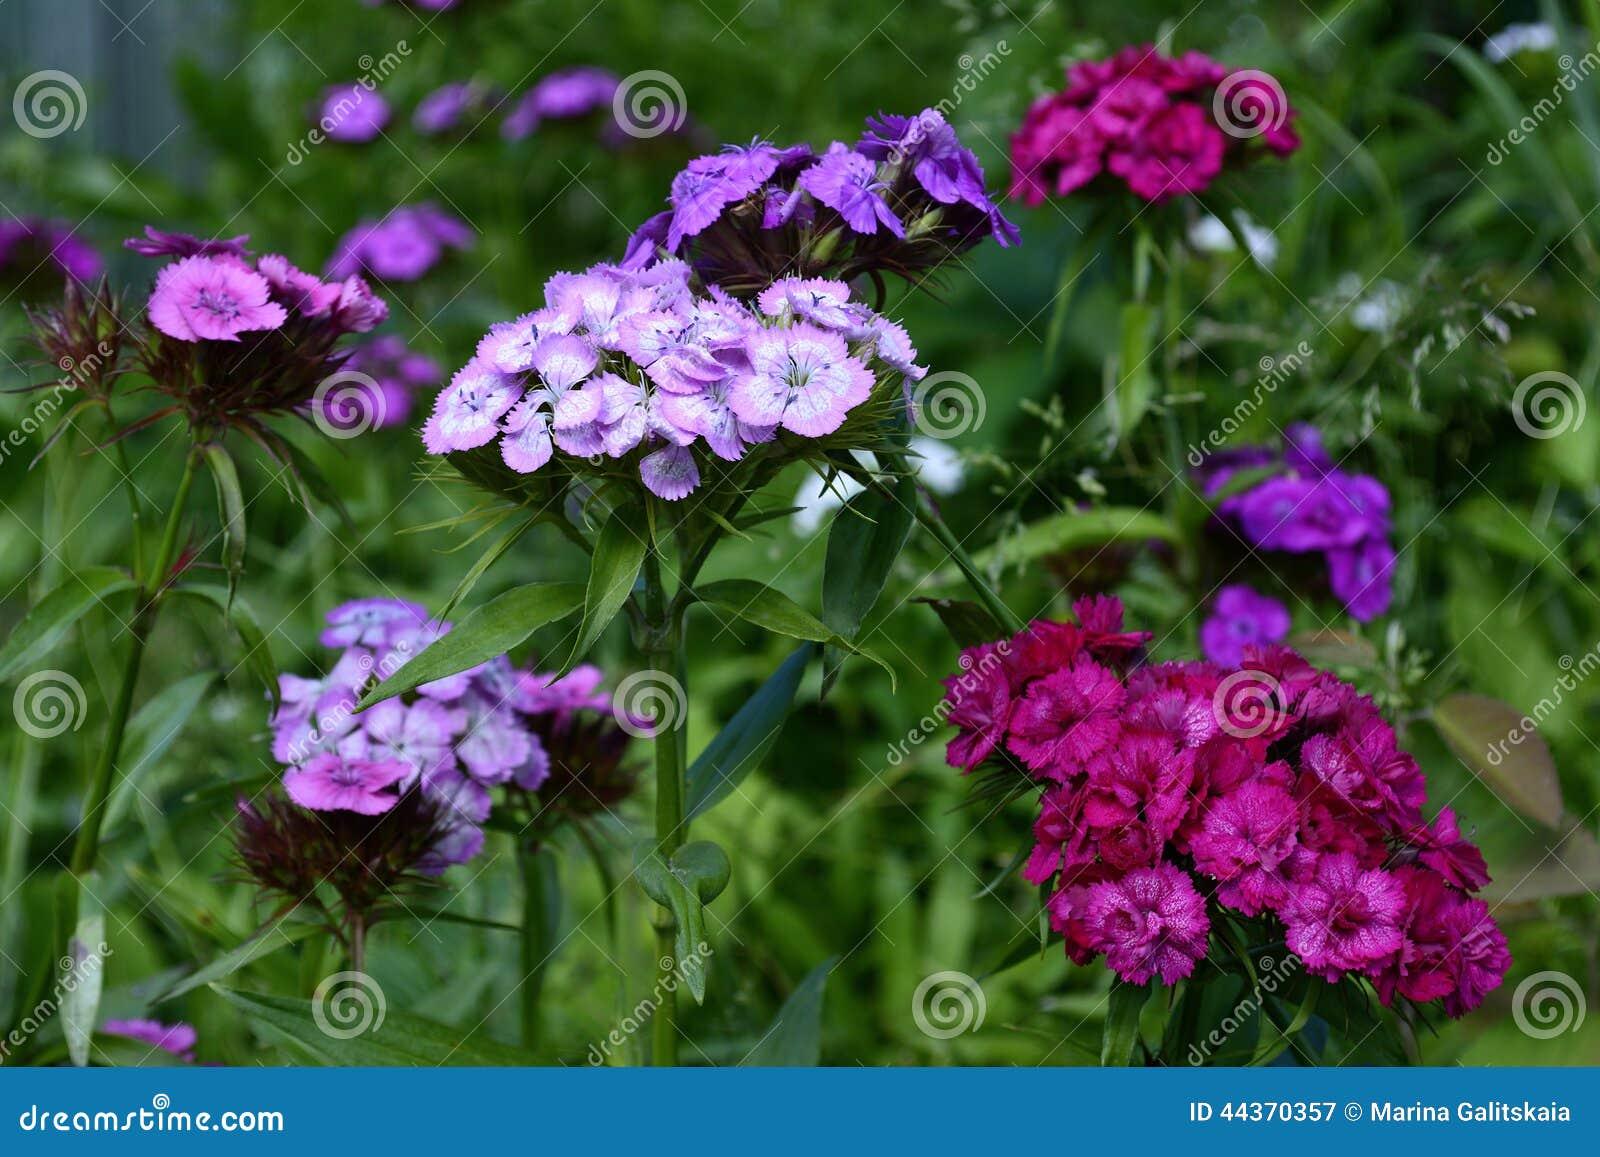 Garofani turchi di fioritura